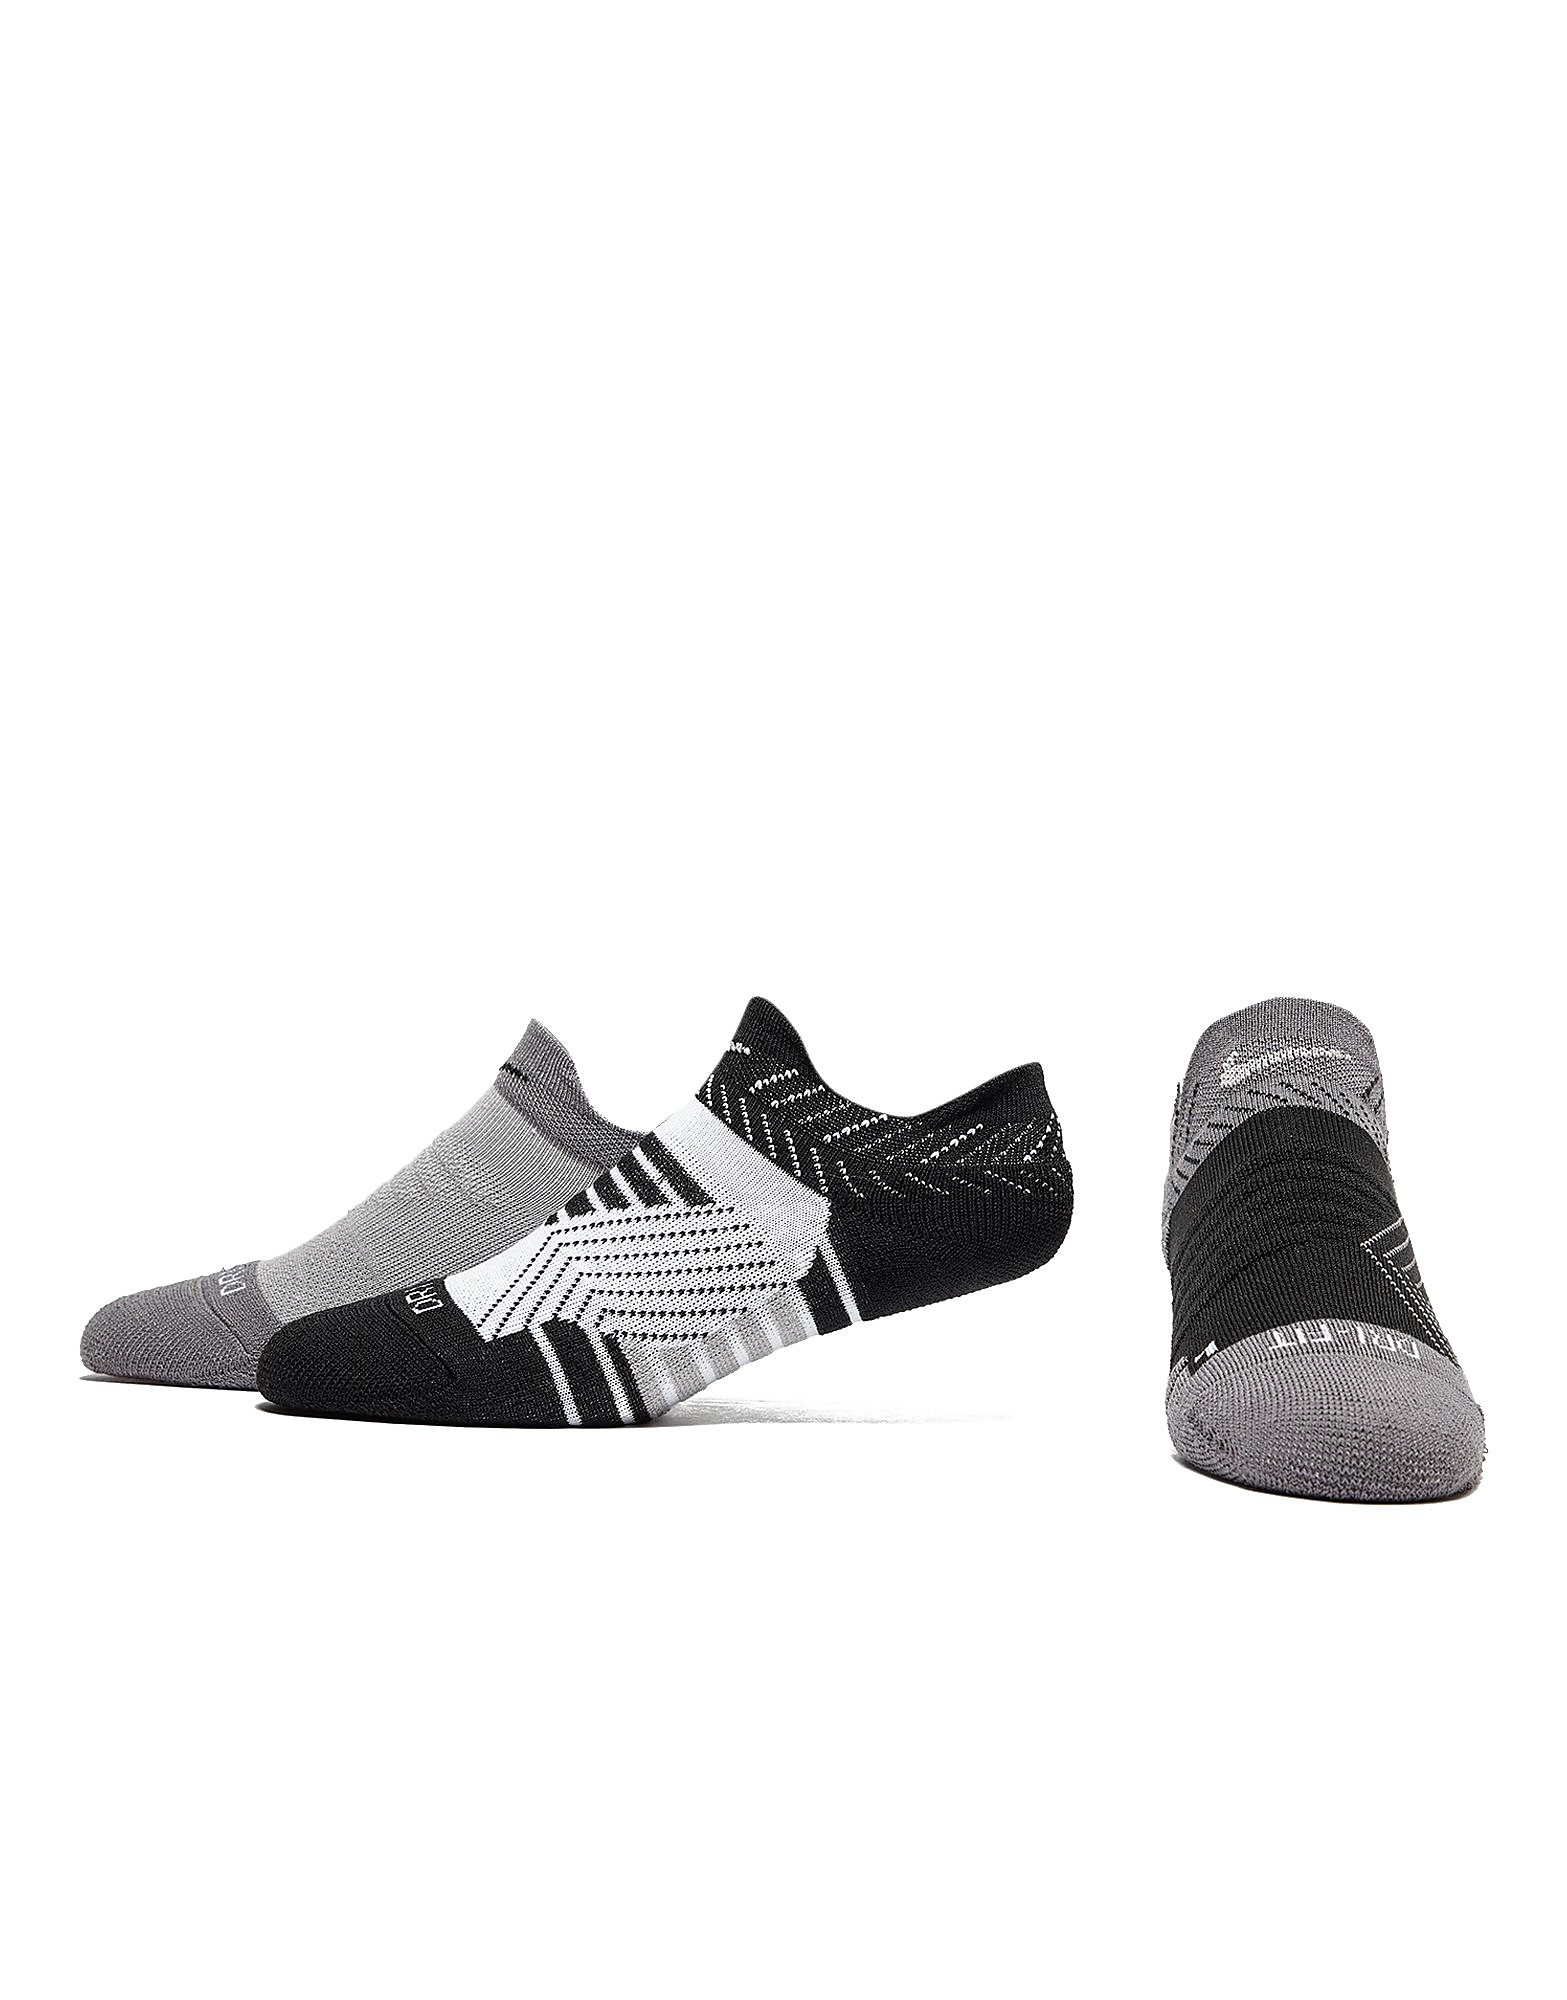 Nike Pack de chaussettes 3 Pack Cushion Homme